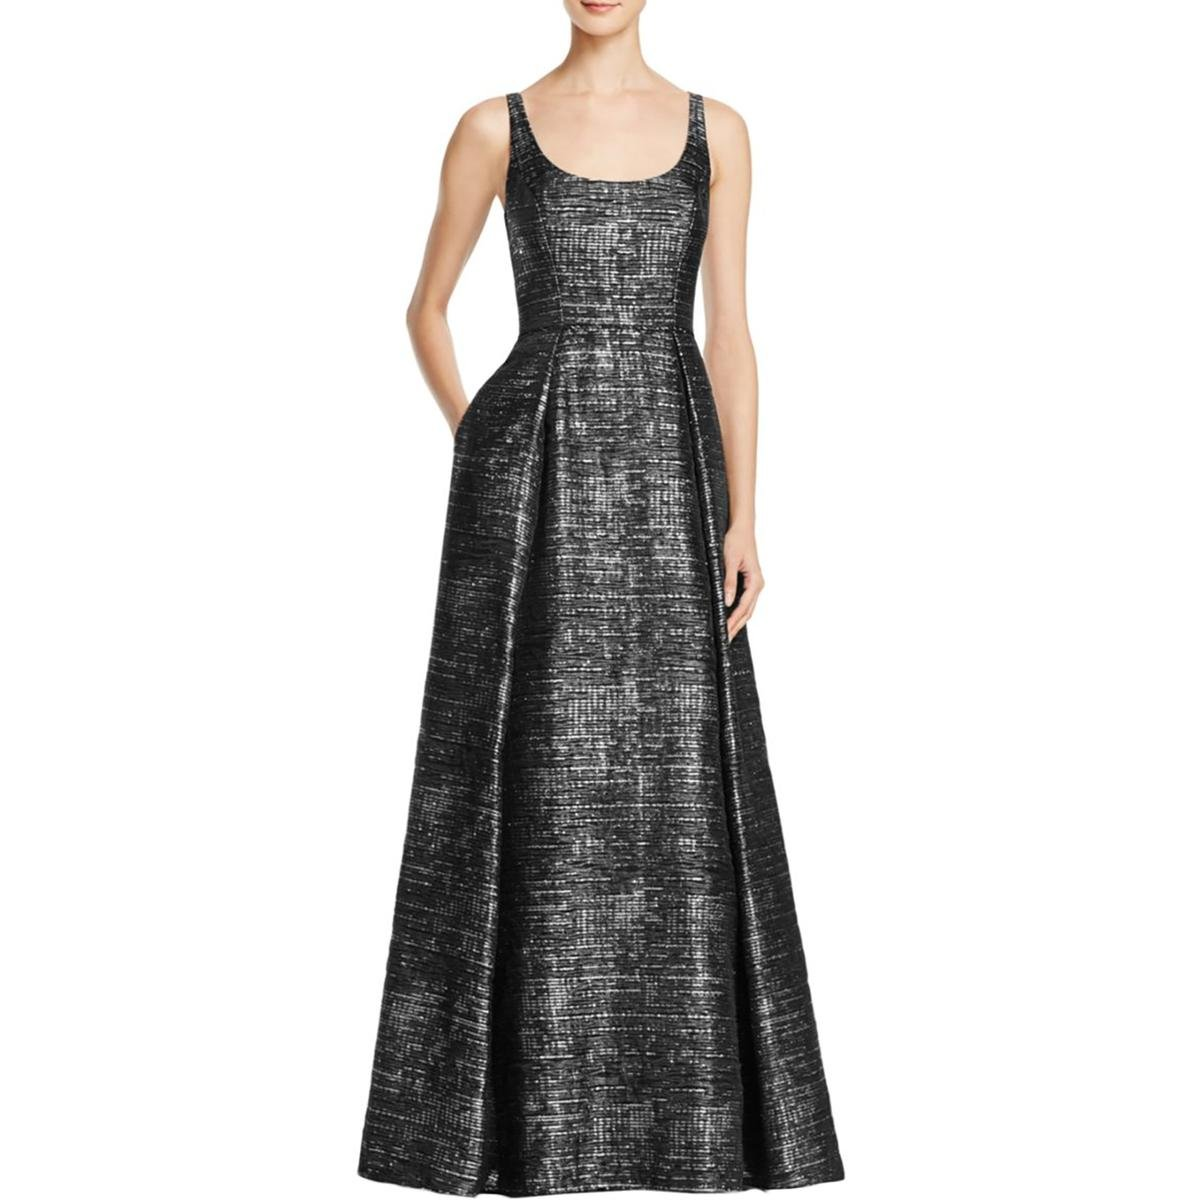 Aidan Mattox Womens Jacquard Metallic Evening Dress Black 10